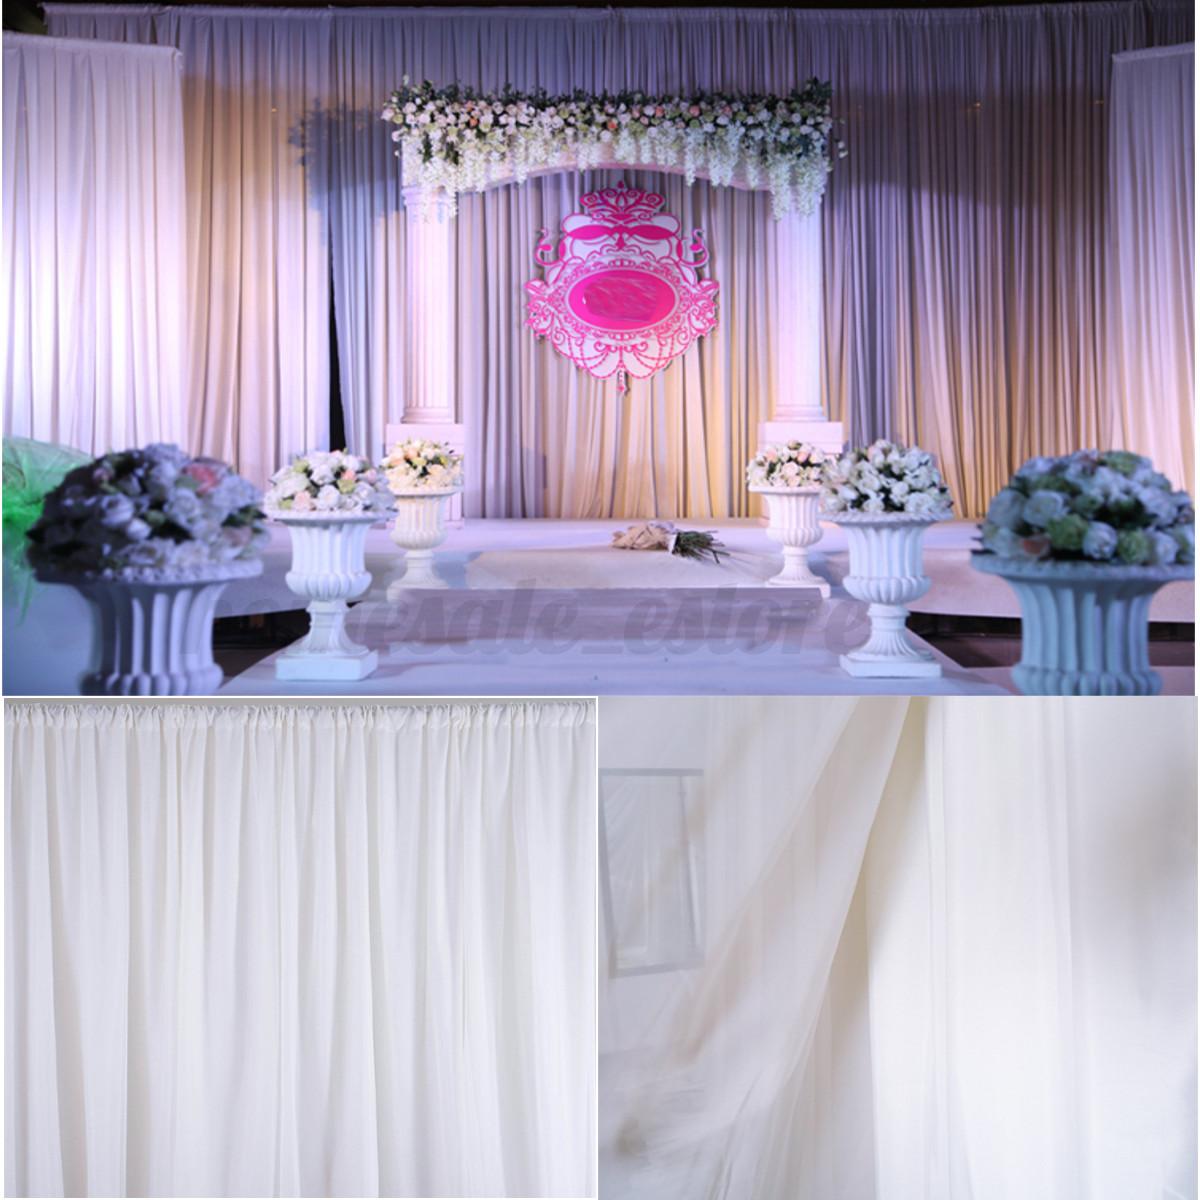 Wedding White Event: 2.4M White Wedding Party Backdrop Curtain Drapes